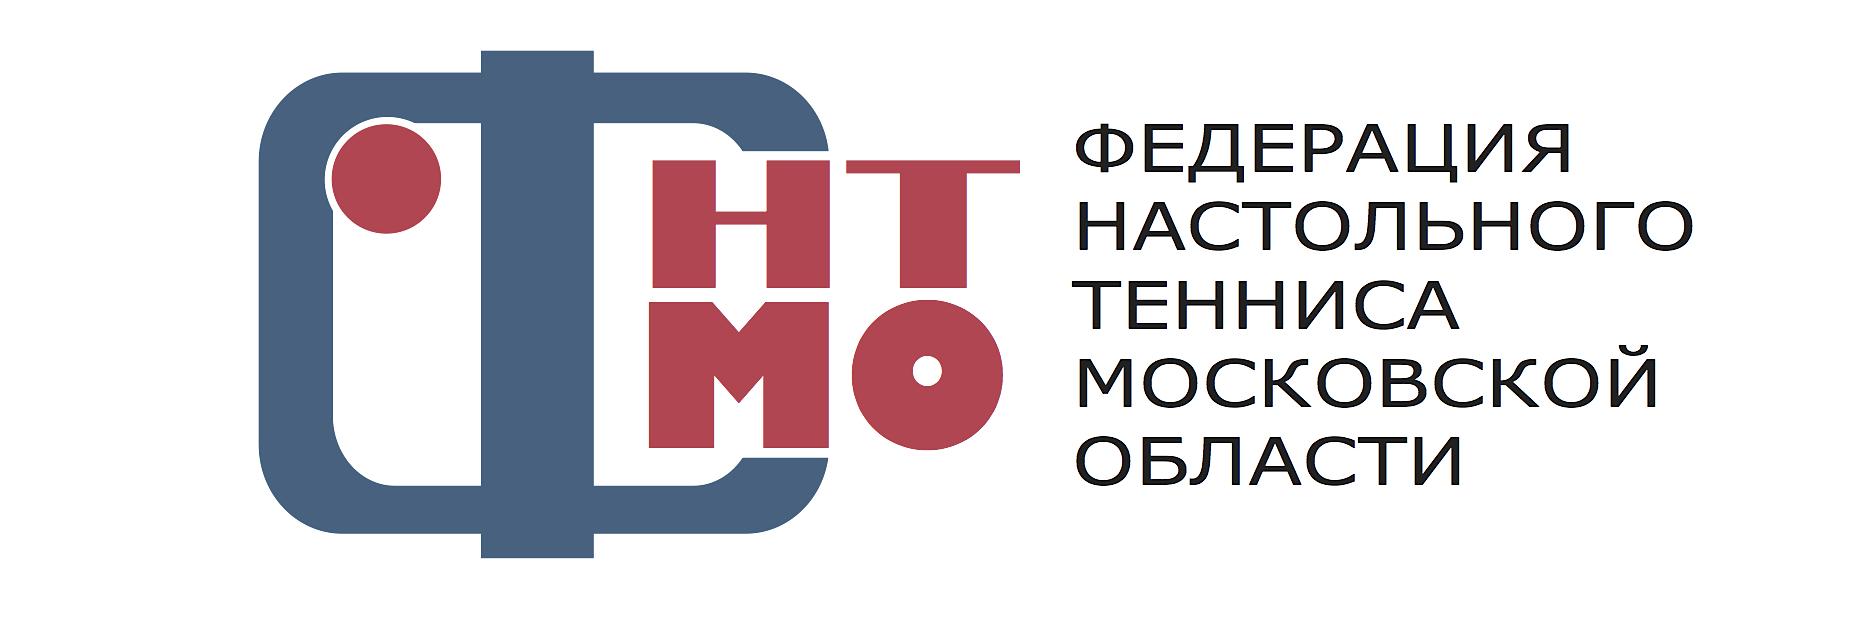 Личное Первенство МО 2009 г.р. и моложе @ Орехово-Зуево